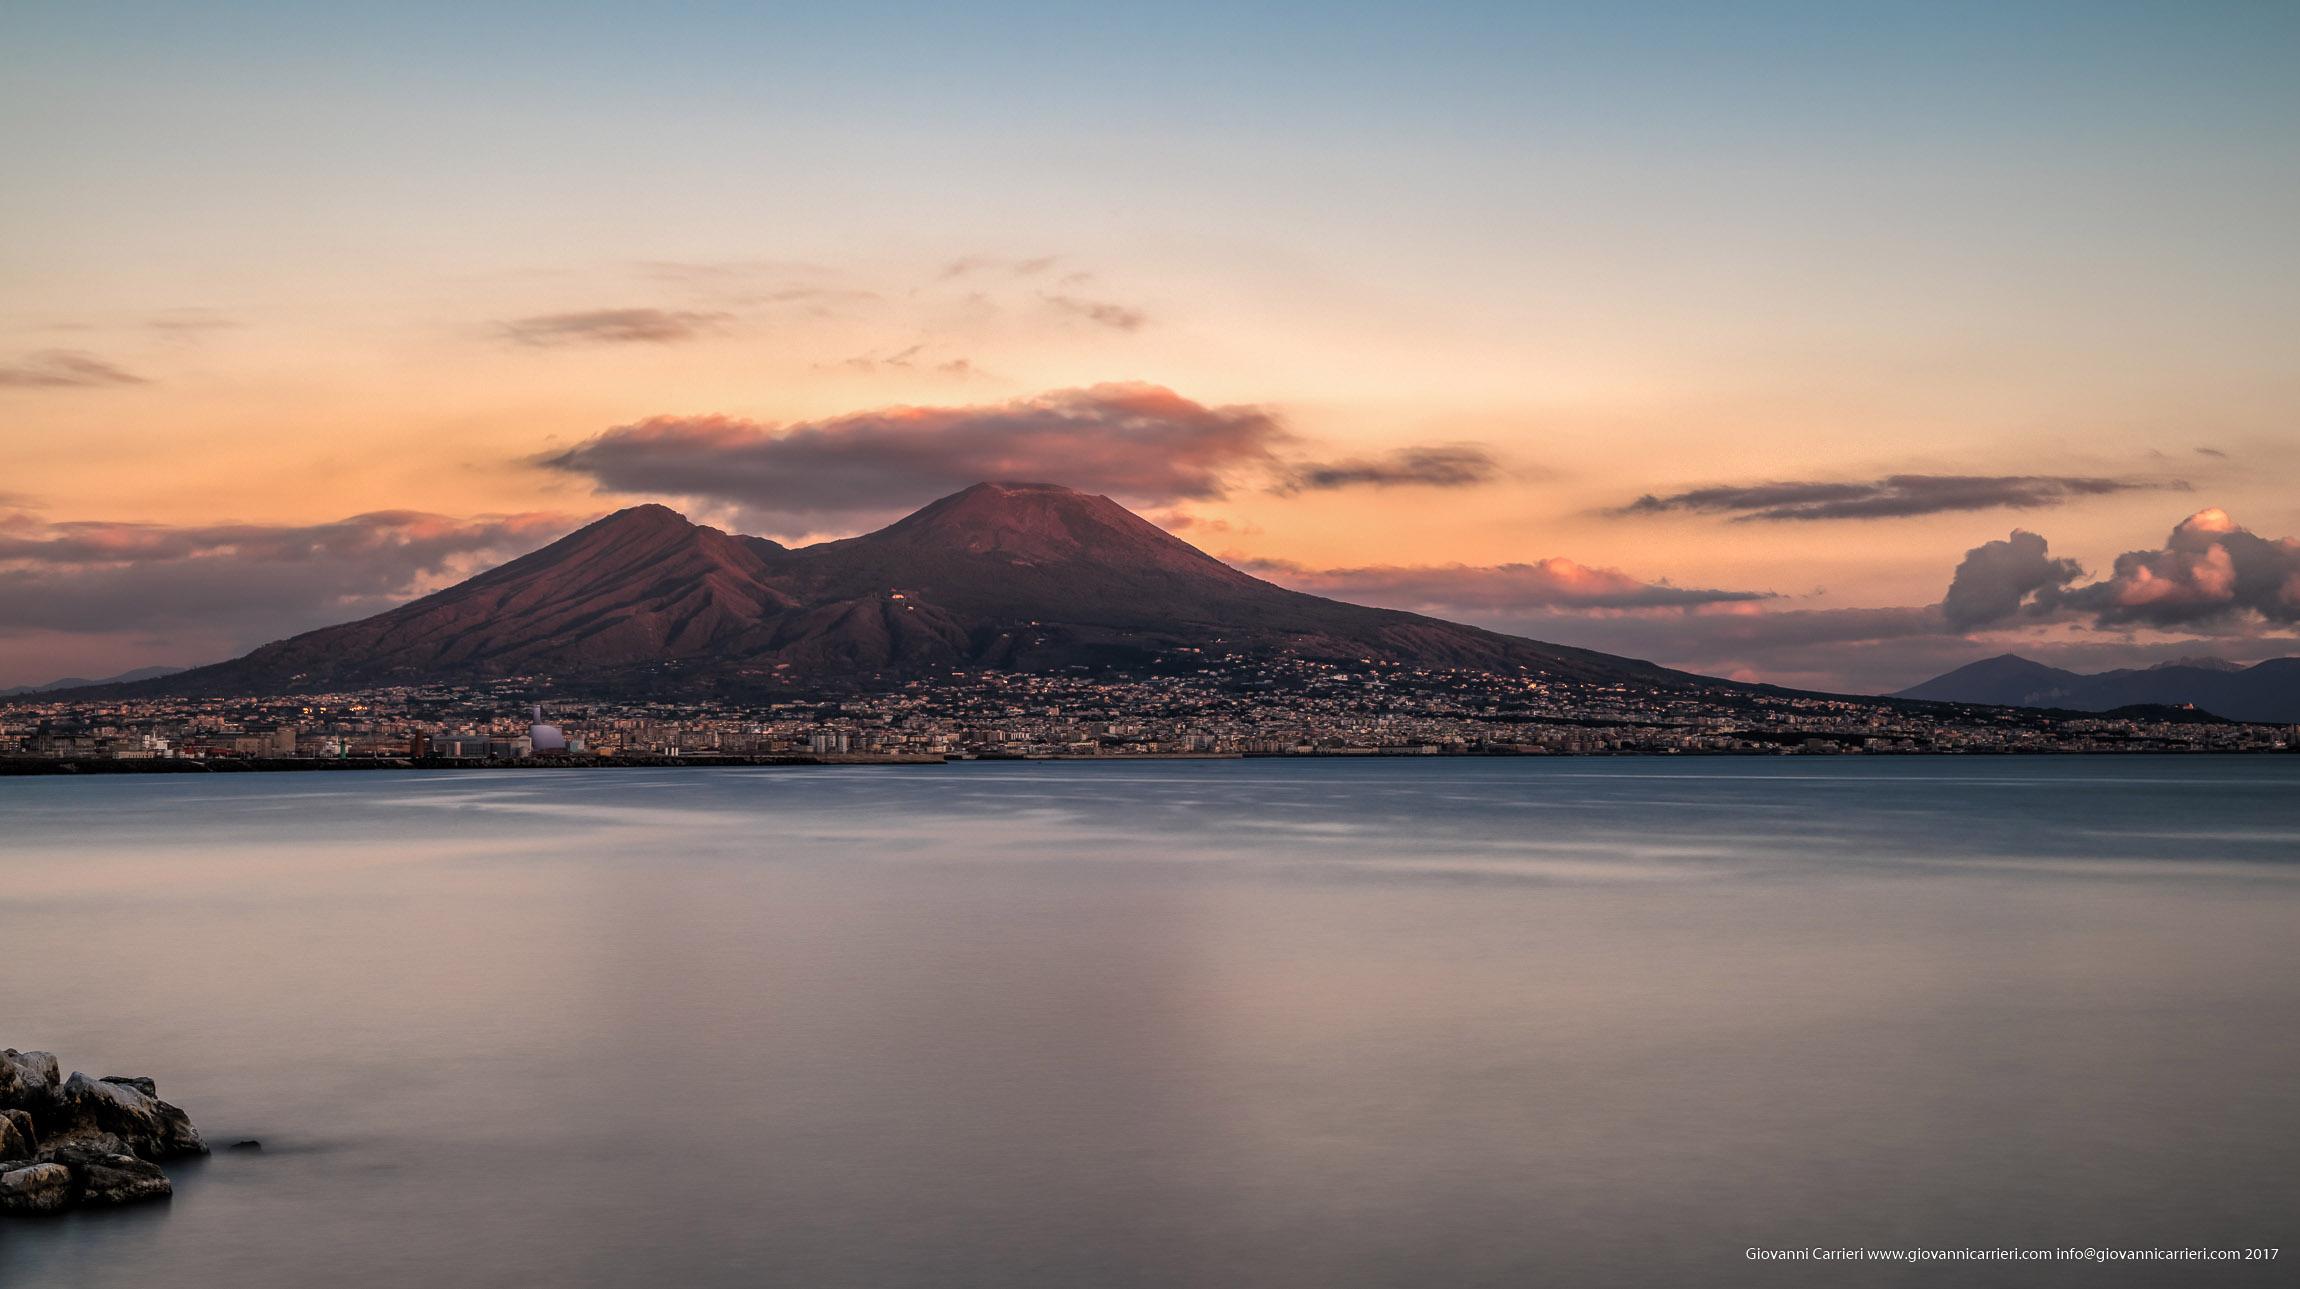 Sunset on Vesuvio, viewed from Naples